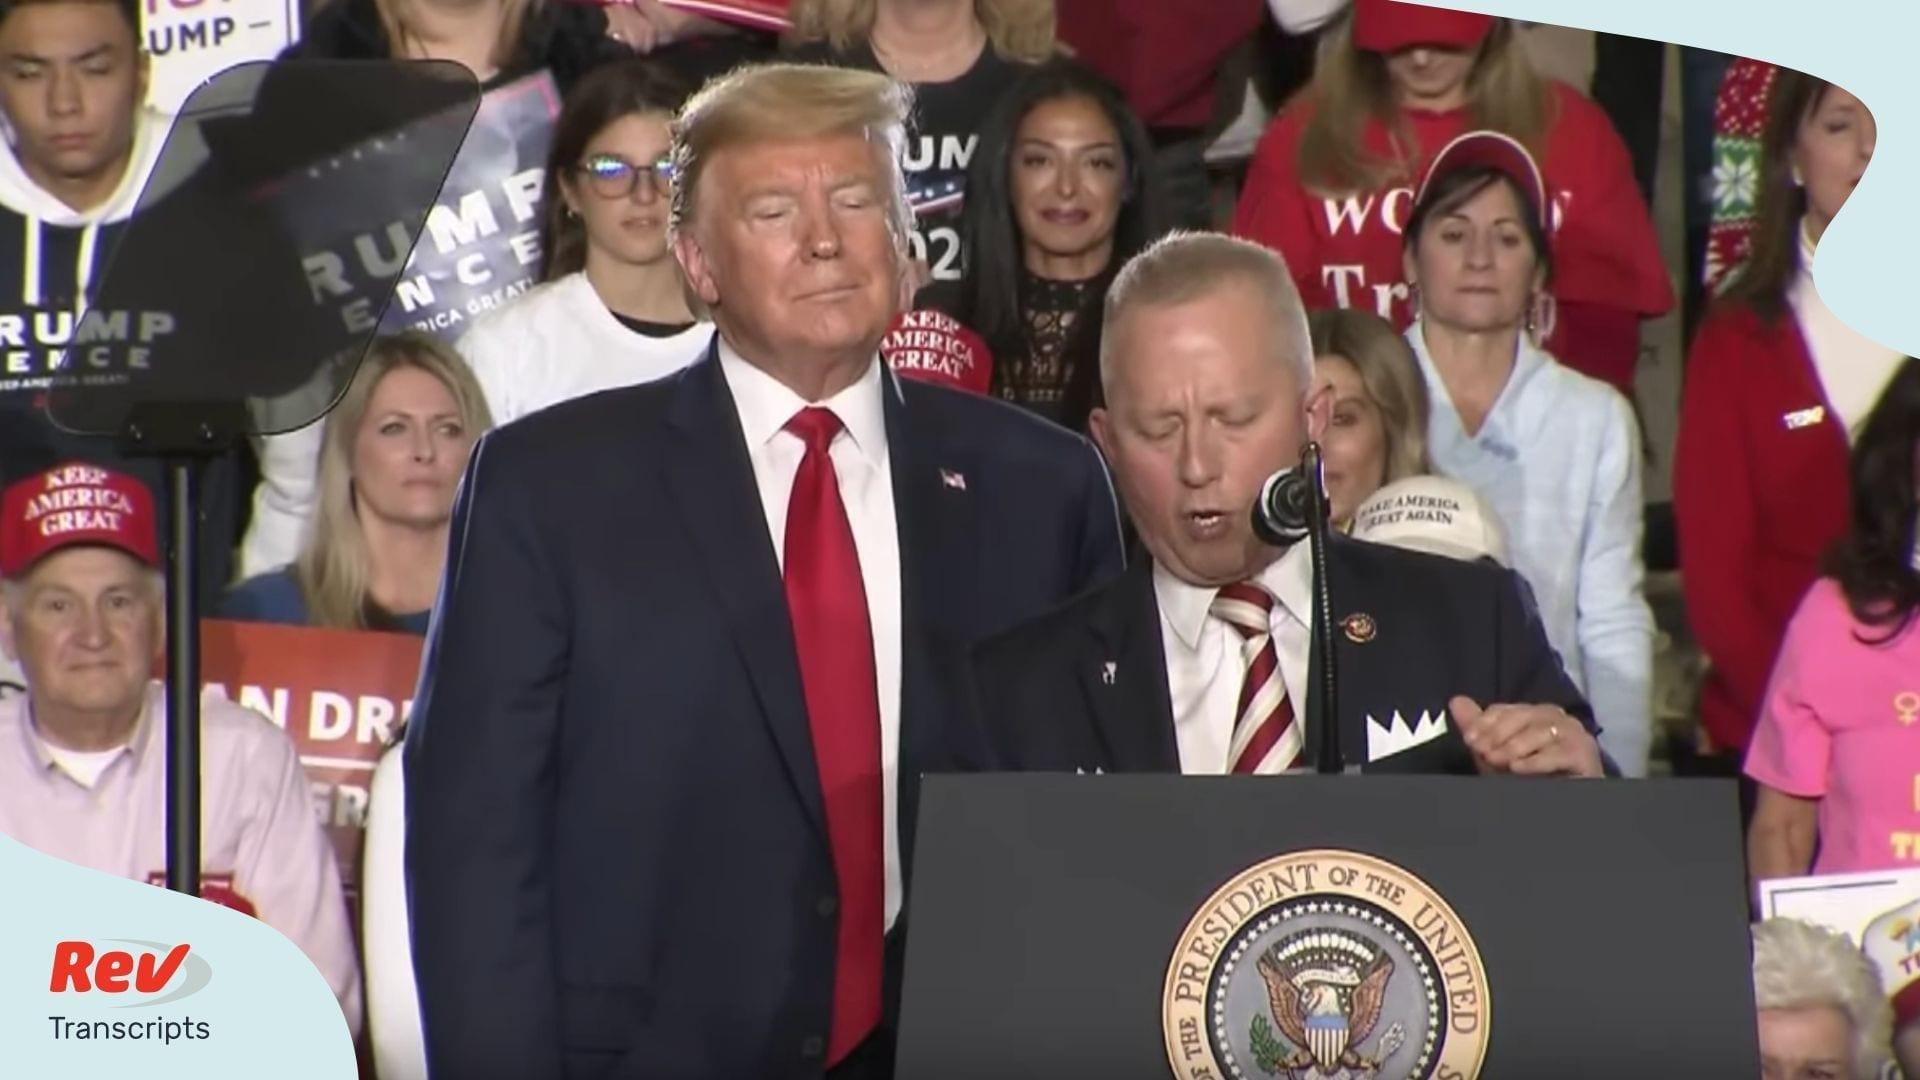 Donald Trump New Jersey Rally Transcript